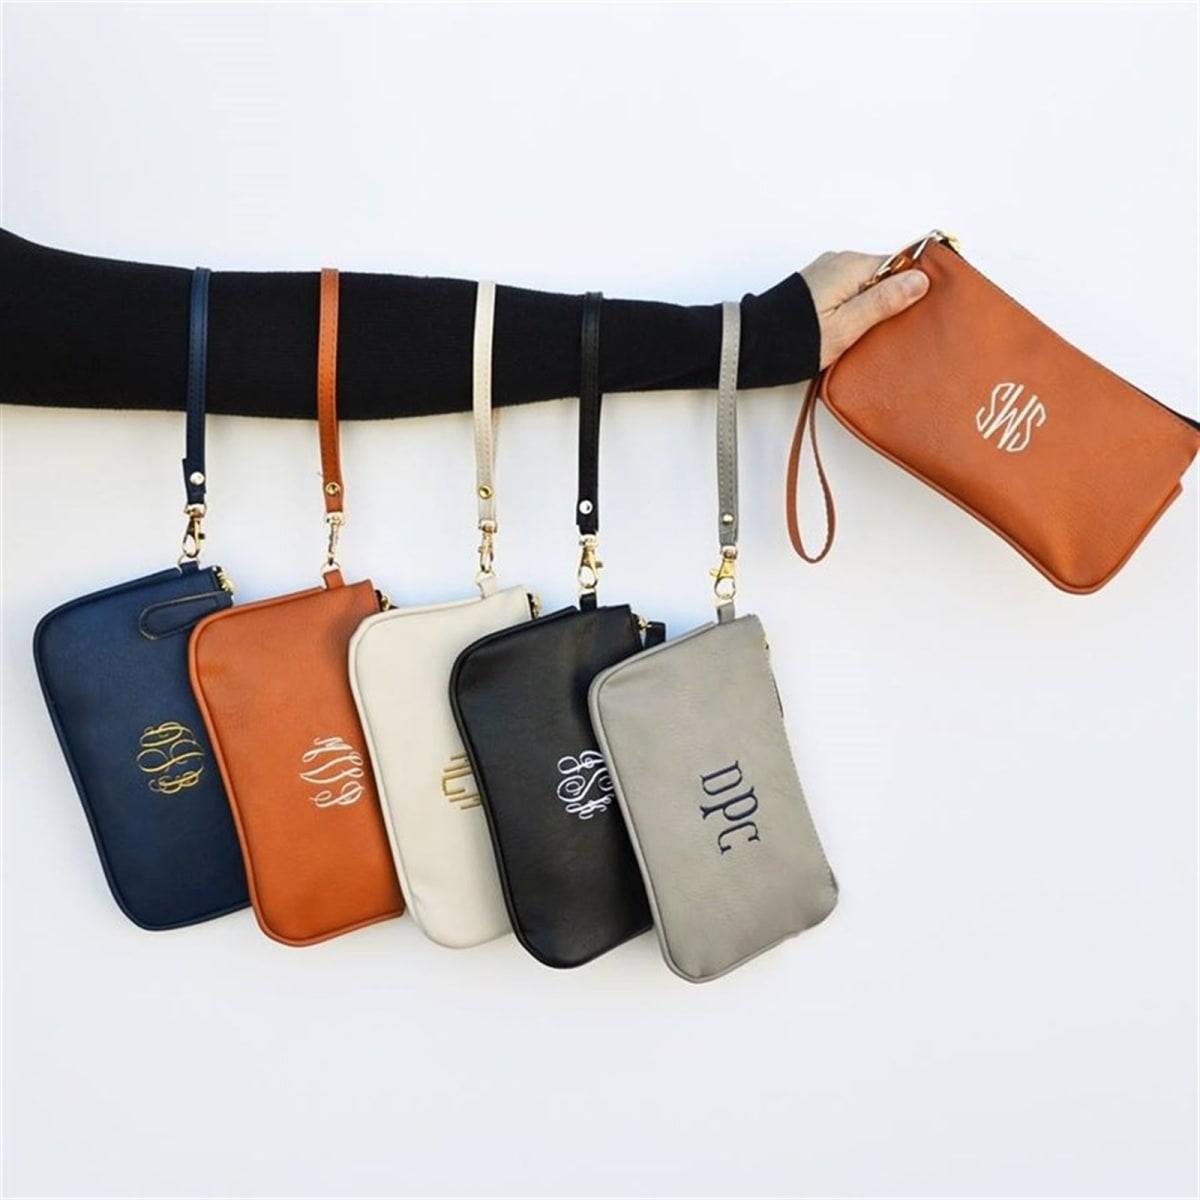 .99 Personalized Wristlets + Free shipping at Jane!